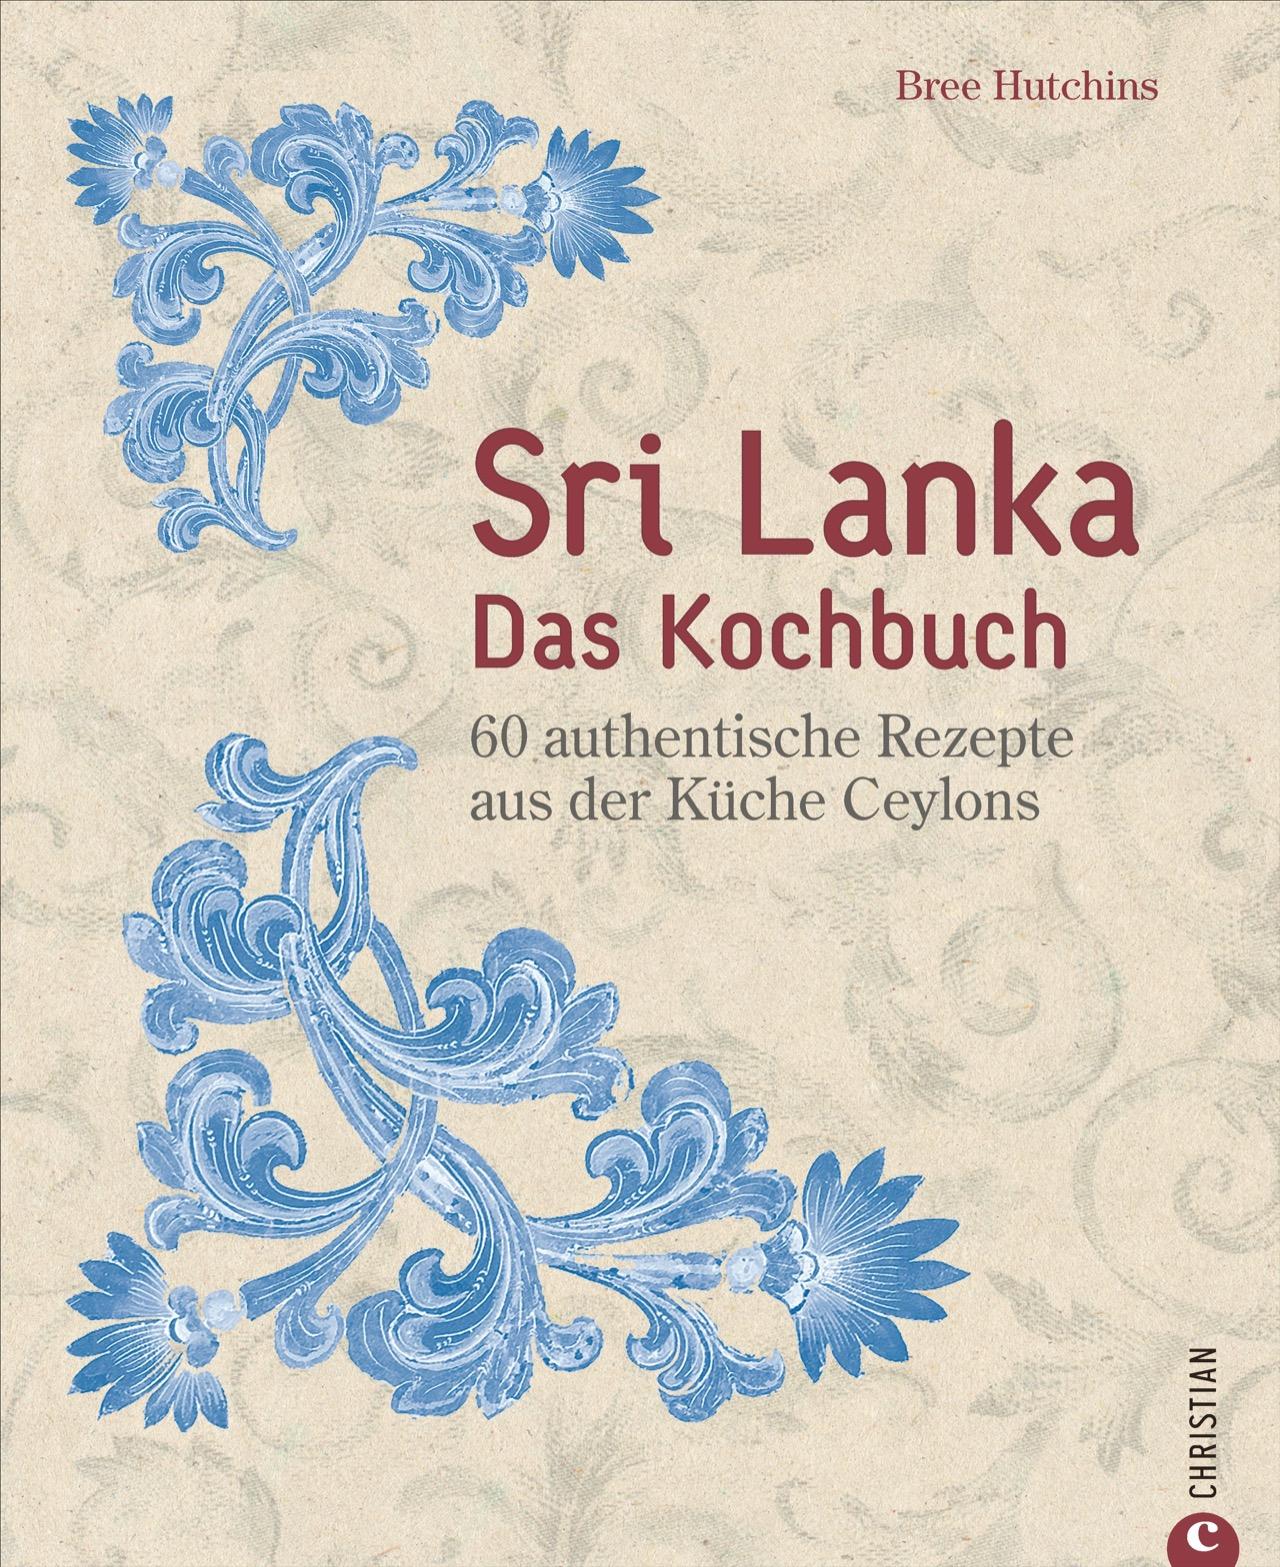 Sri Lanka - Das Kochbuch Bree Hutchins